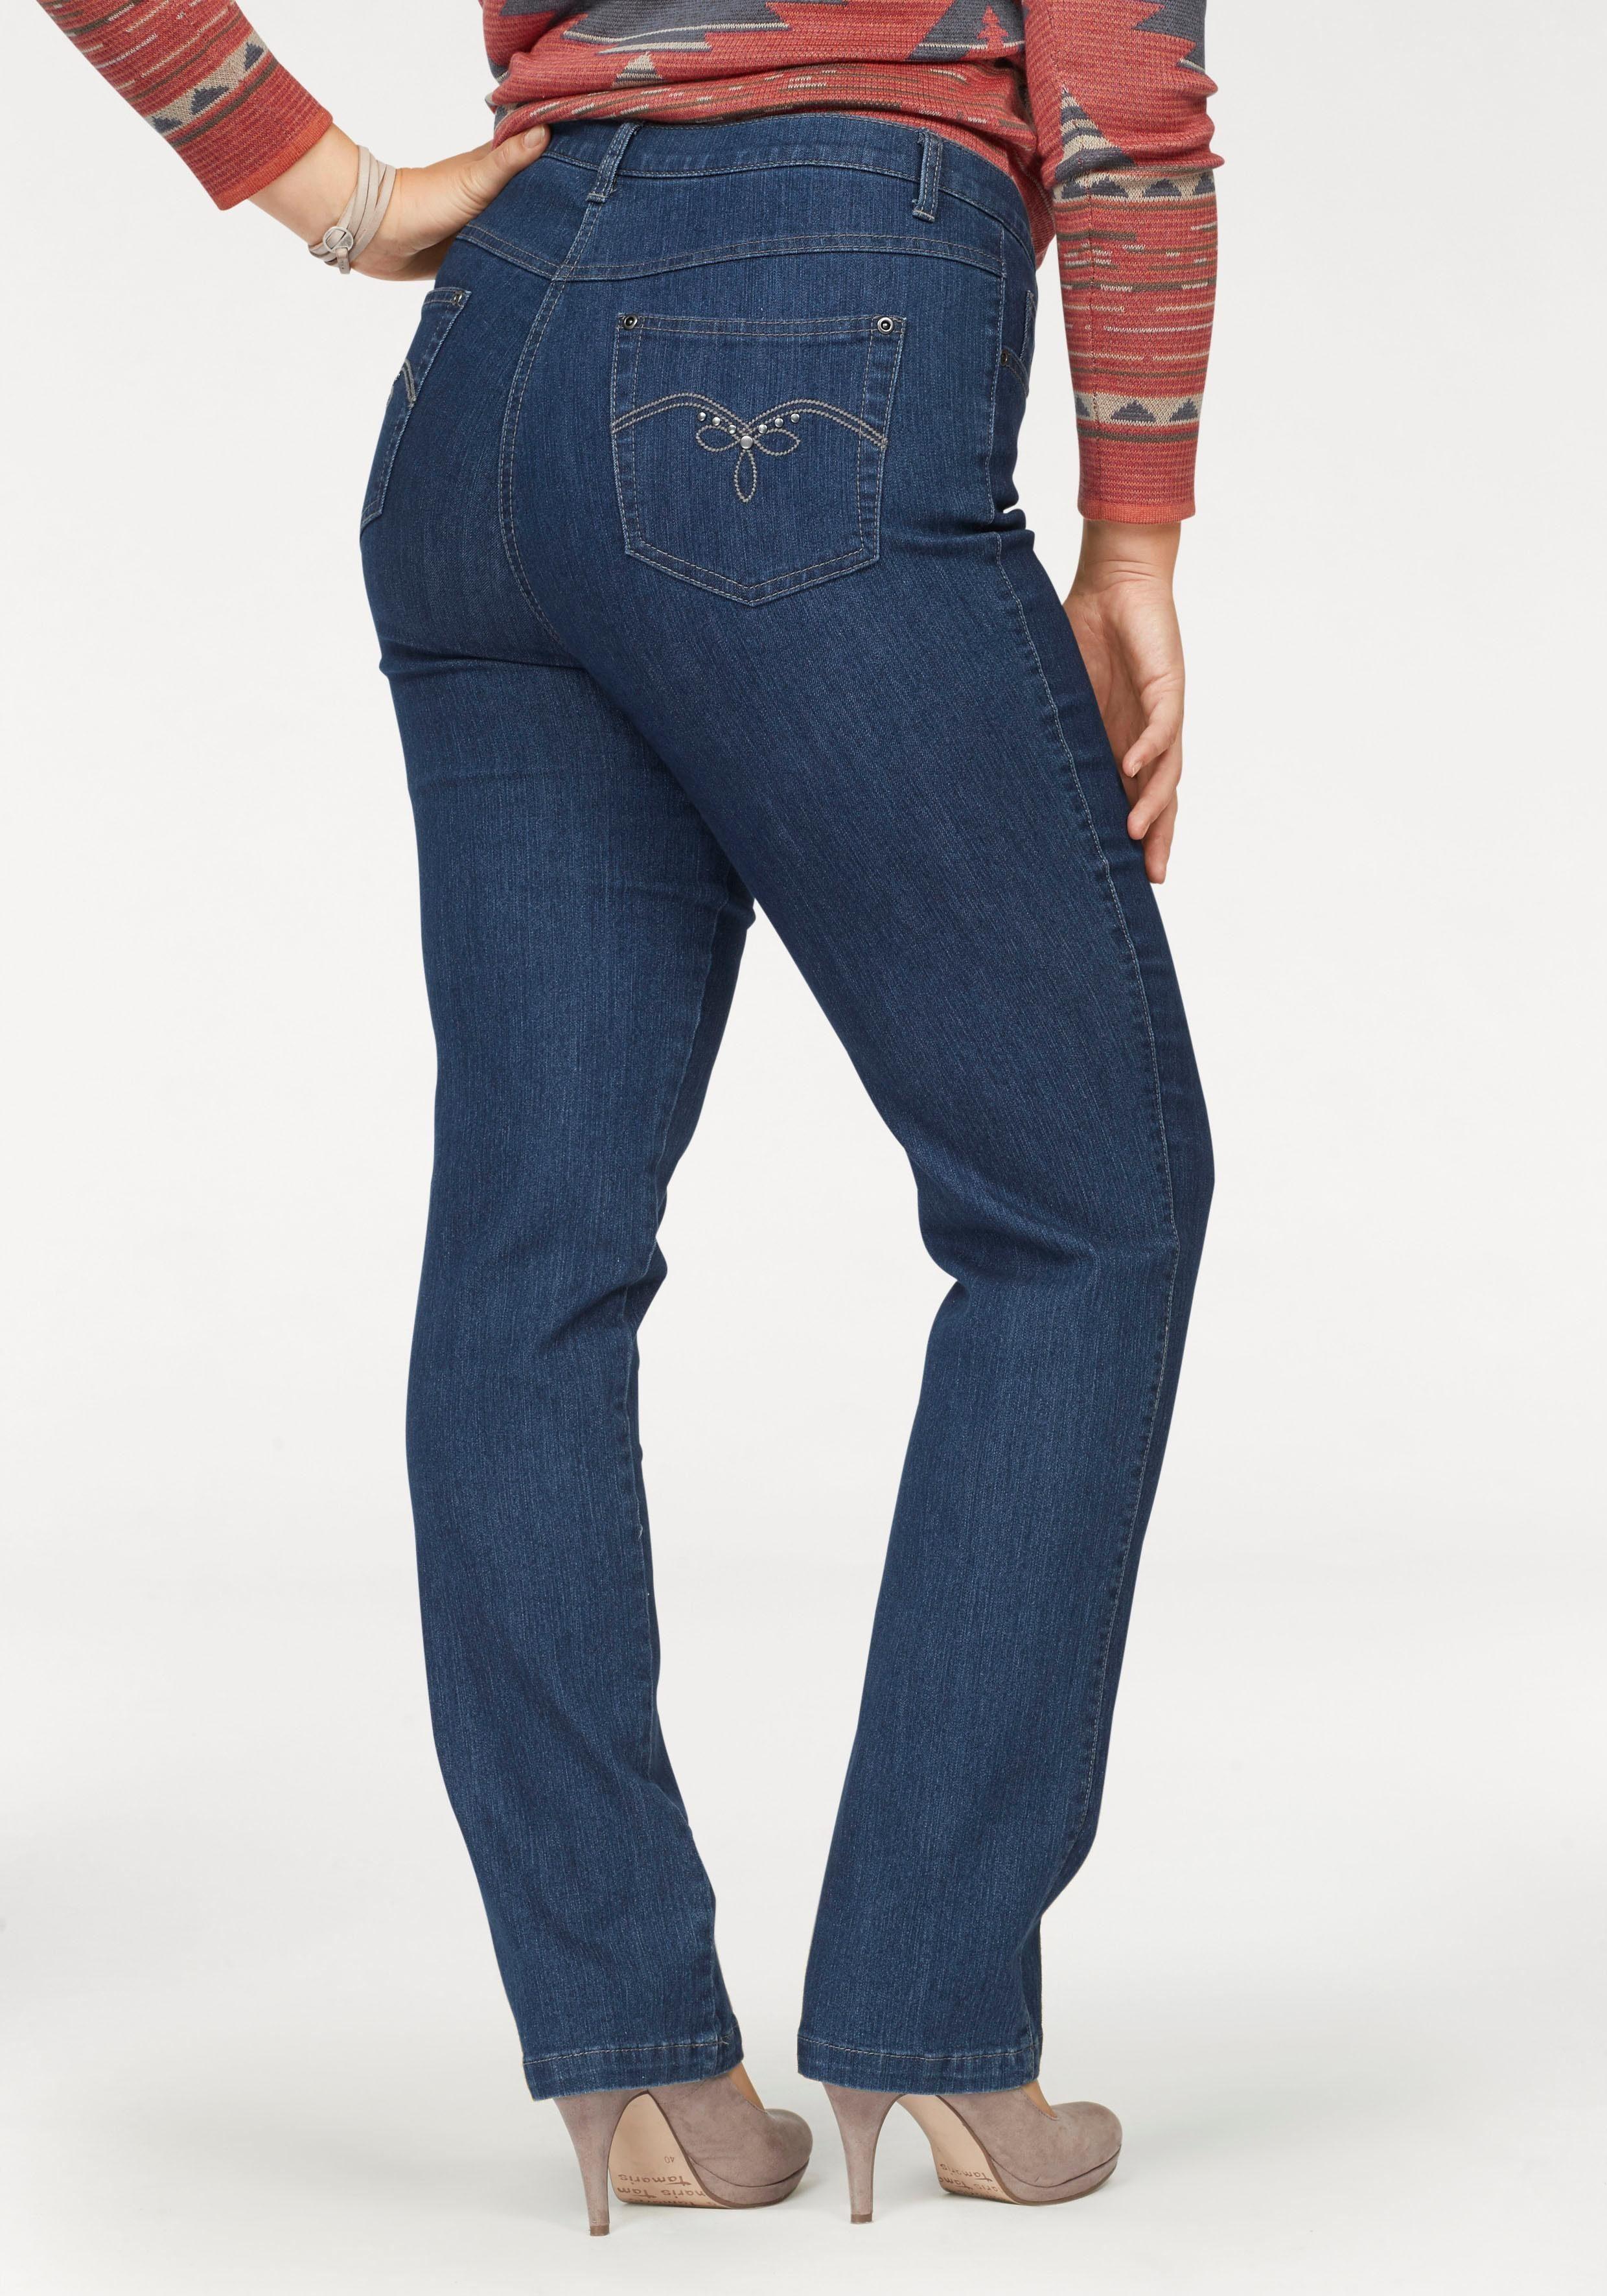 Arizona Gerade Jeans Comfort Fit